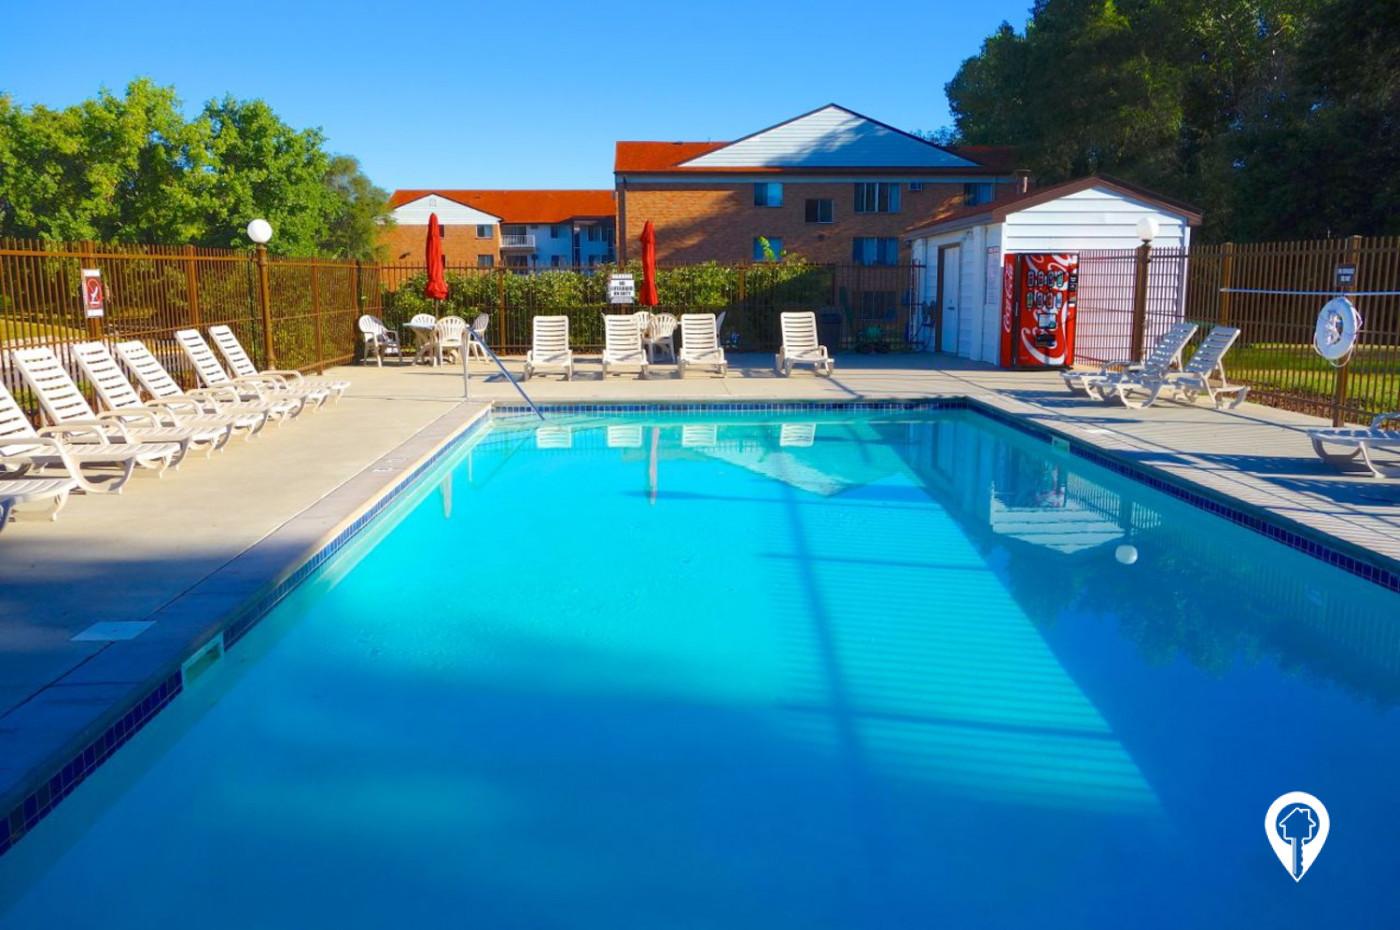 Colonial-Villa-Apartments-Outdoor-Community-Pool